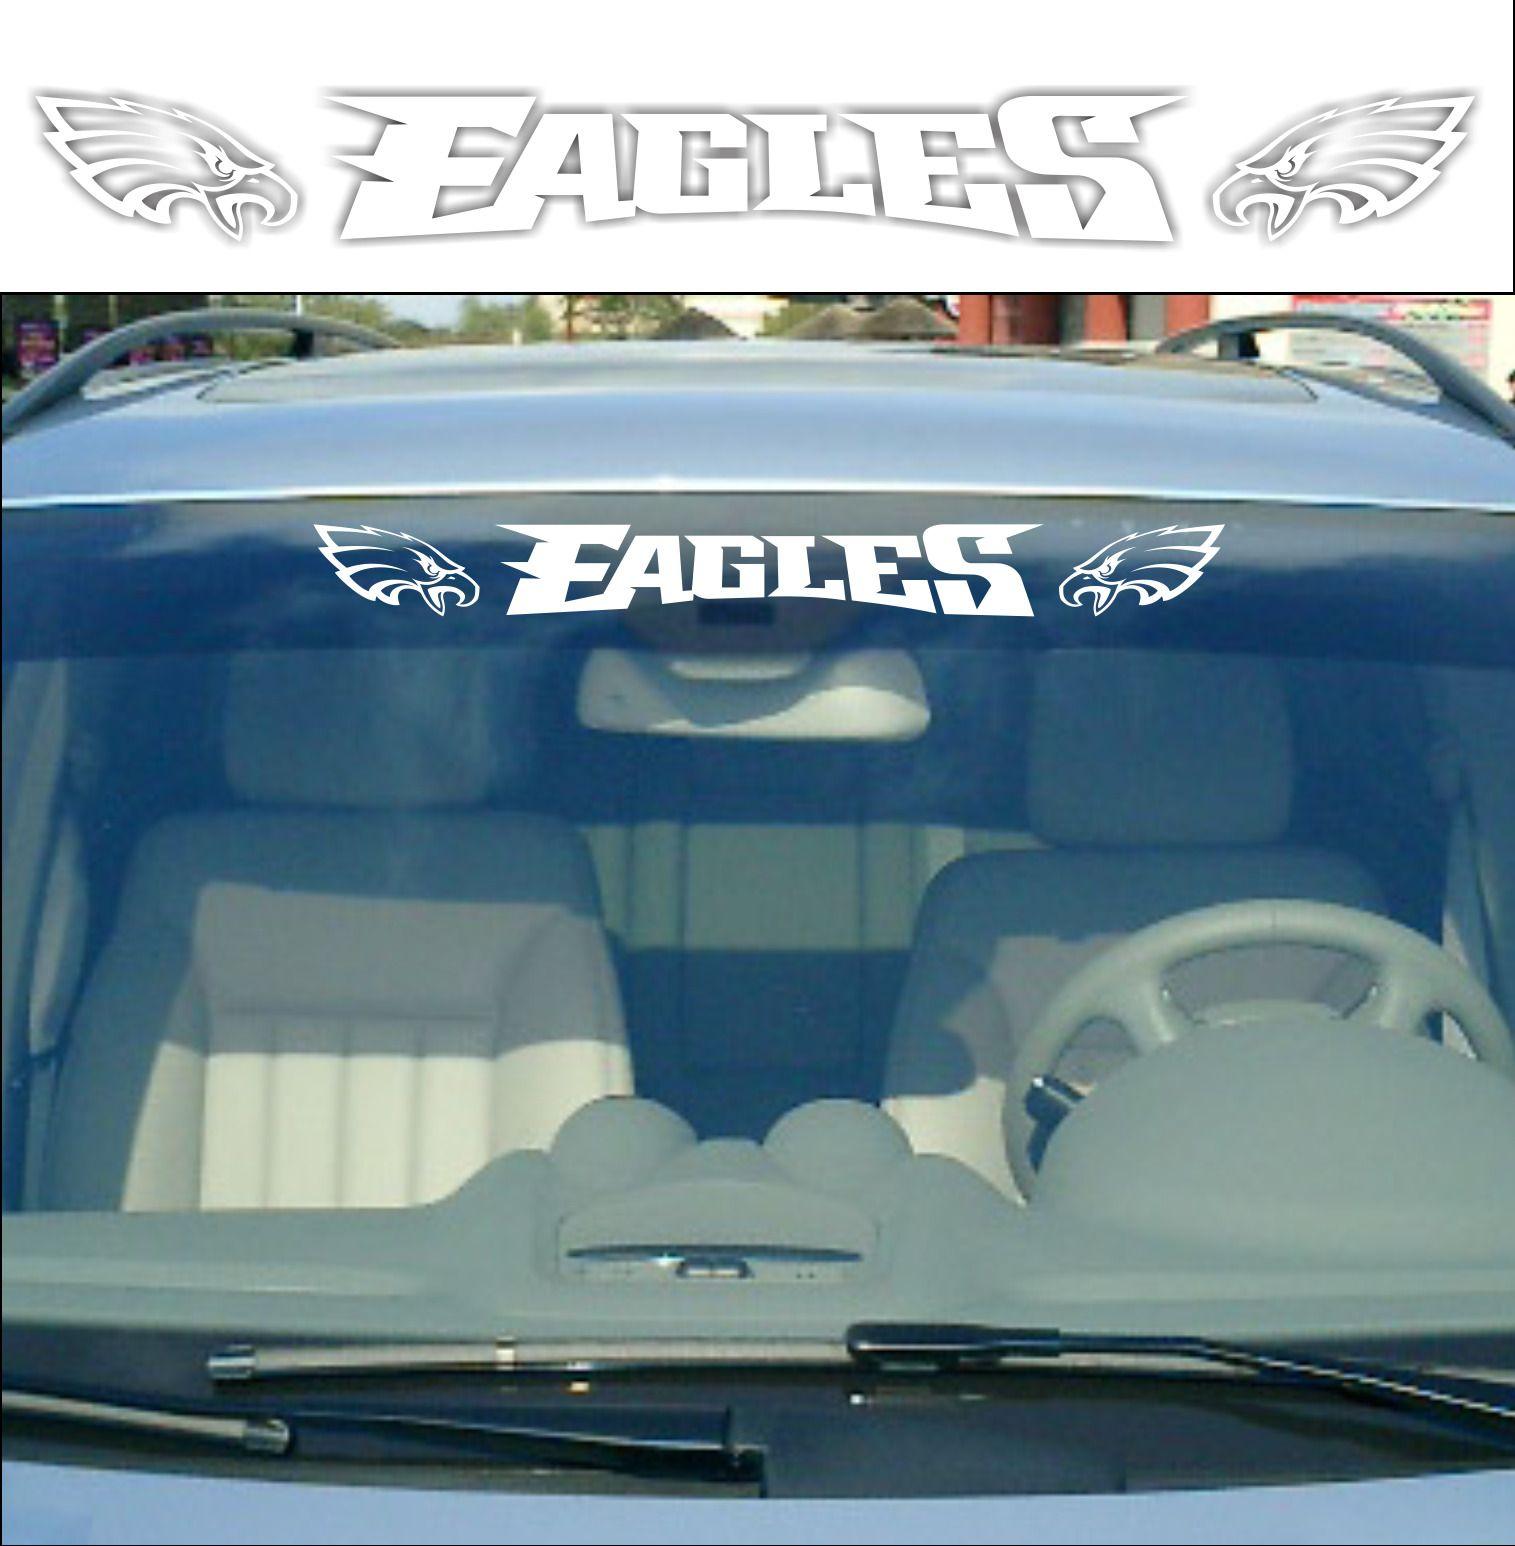 Philadelphia Eagles 24 Vinyl Car Truck Decal Window Sticker White Window Stickers Custom Vinyl Decal Truck Decals [ 1546 x 1515 Pixel ]